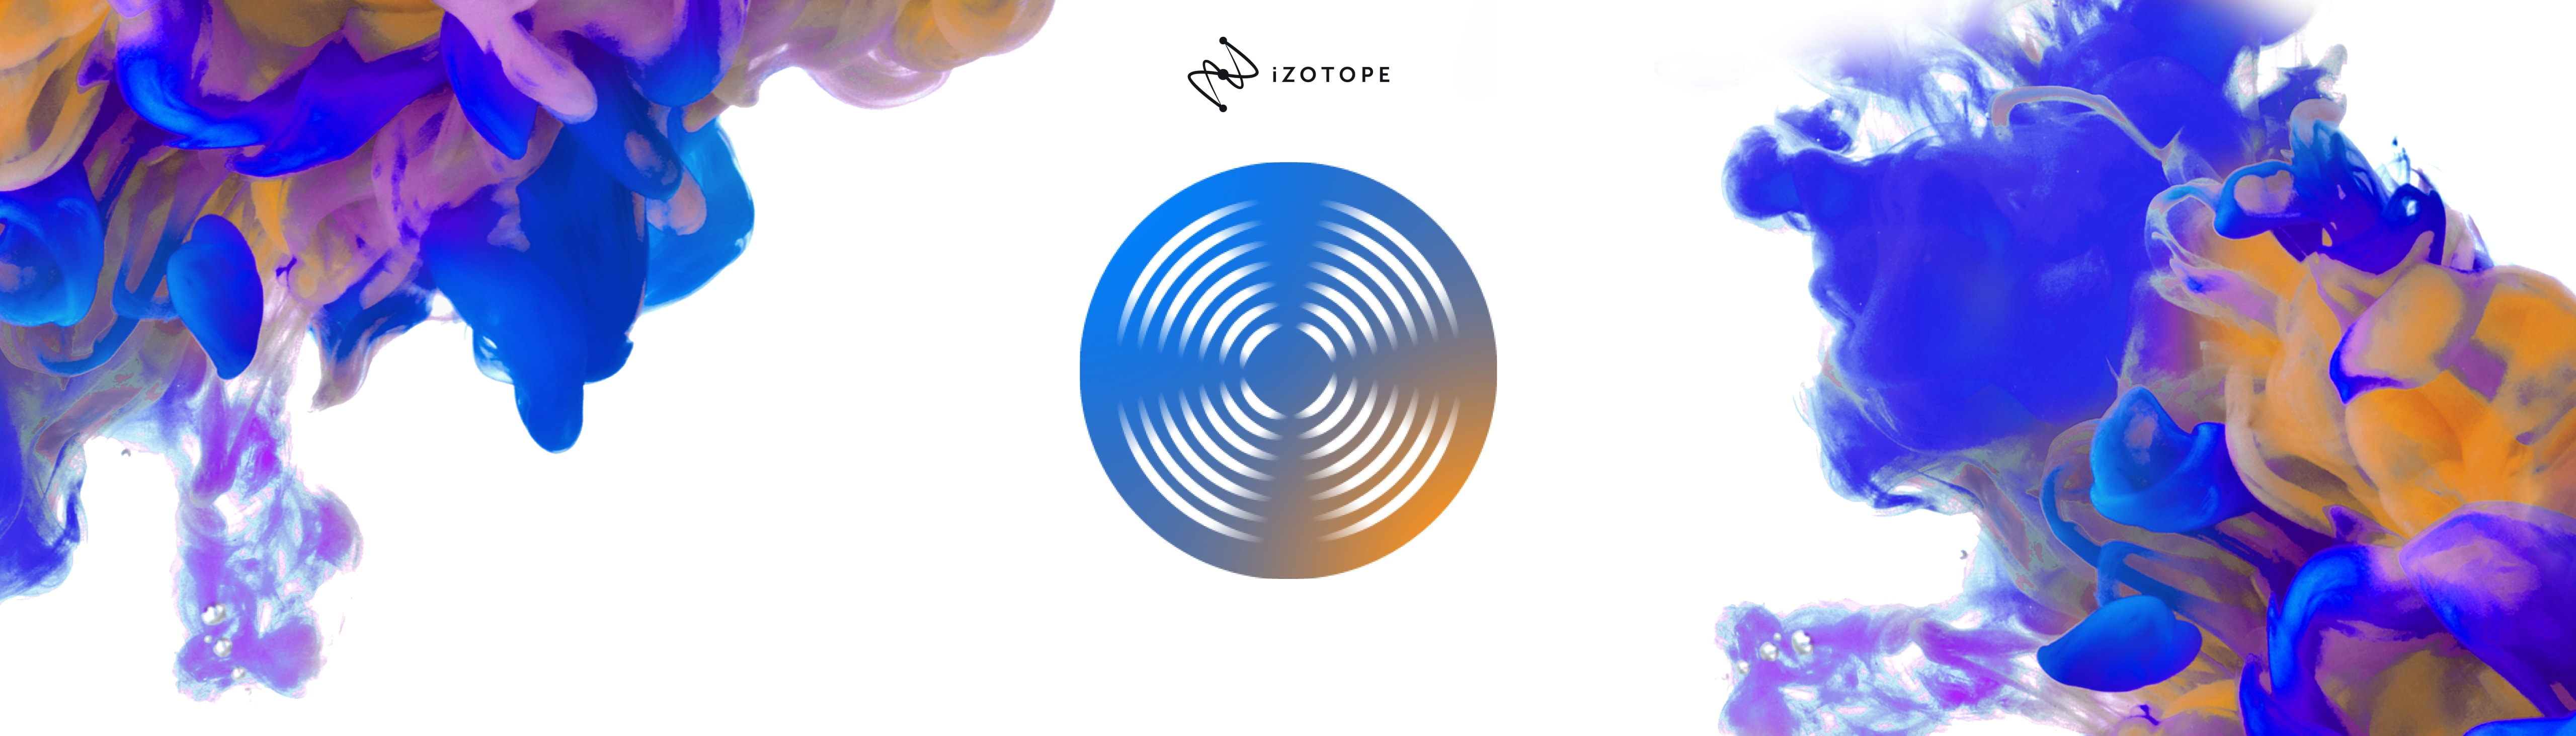 iZotope RX 8 Header